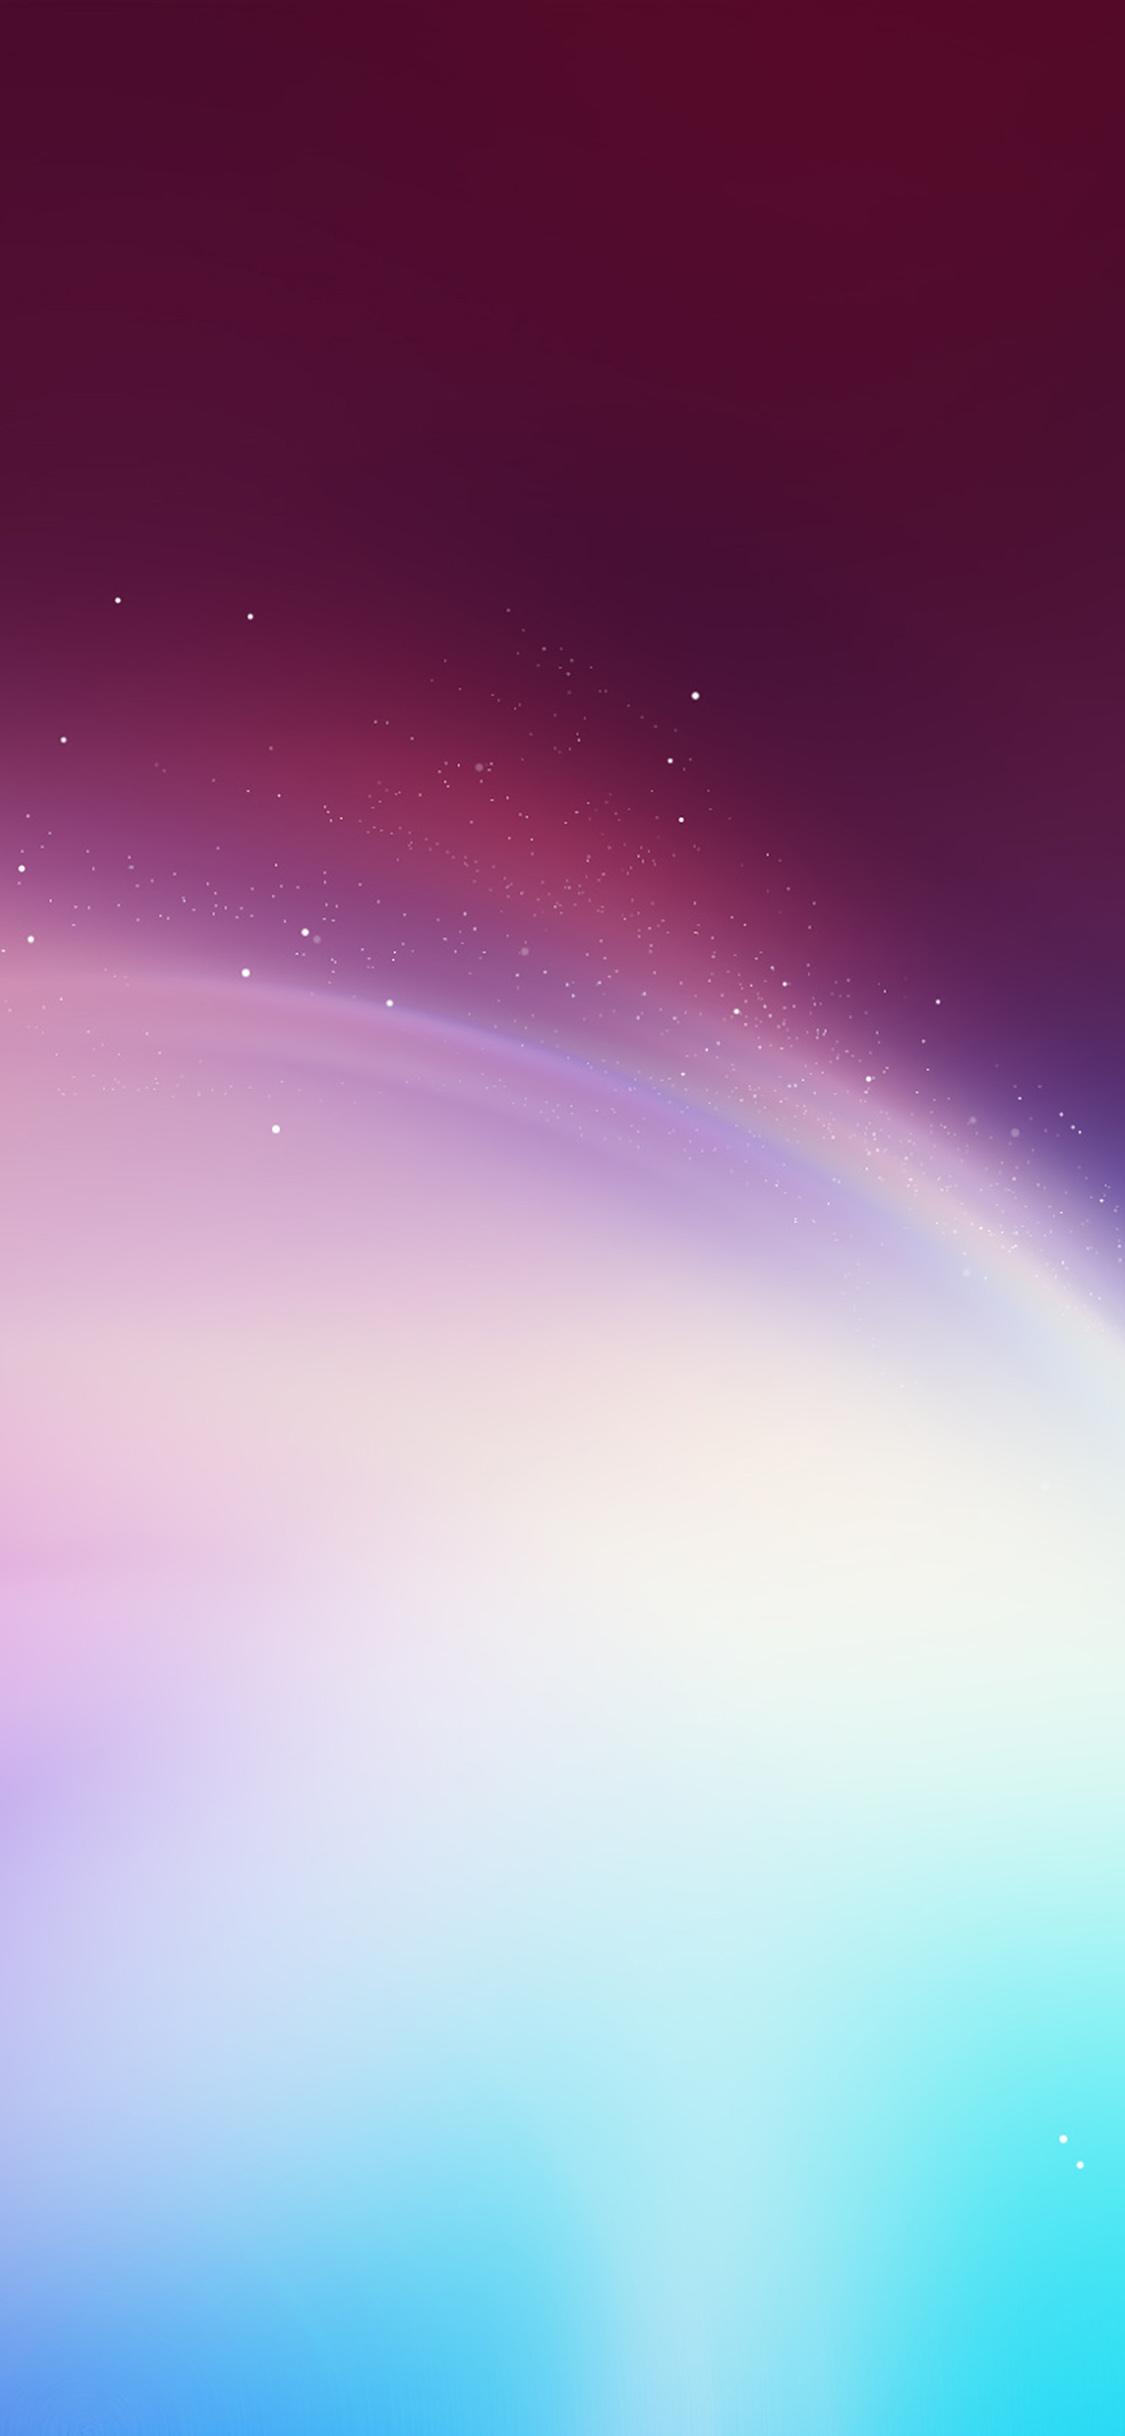 iPhoneXpapers.com-Apple-iPhone-wallpaper-sf75-color-magic-stars-purple-sky-gradation-blur